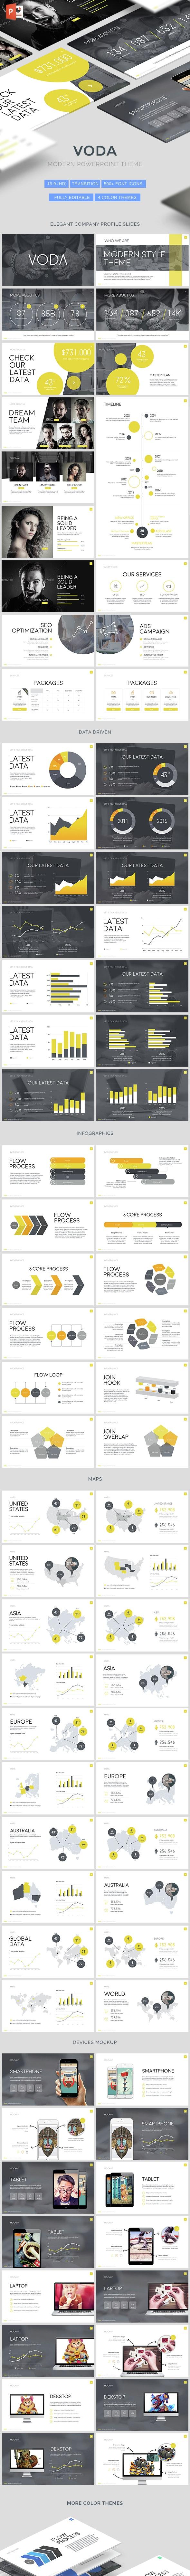 Voda - Creative Powerpoint Template - PowerPoint Templates Presentation Templates